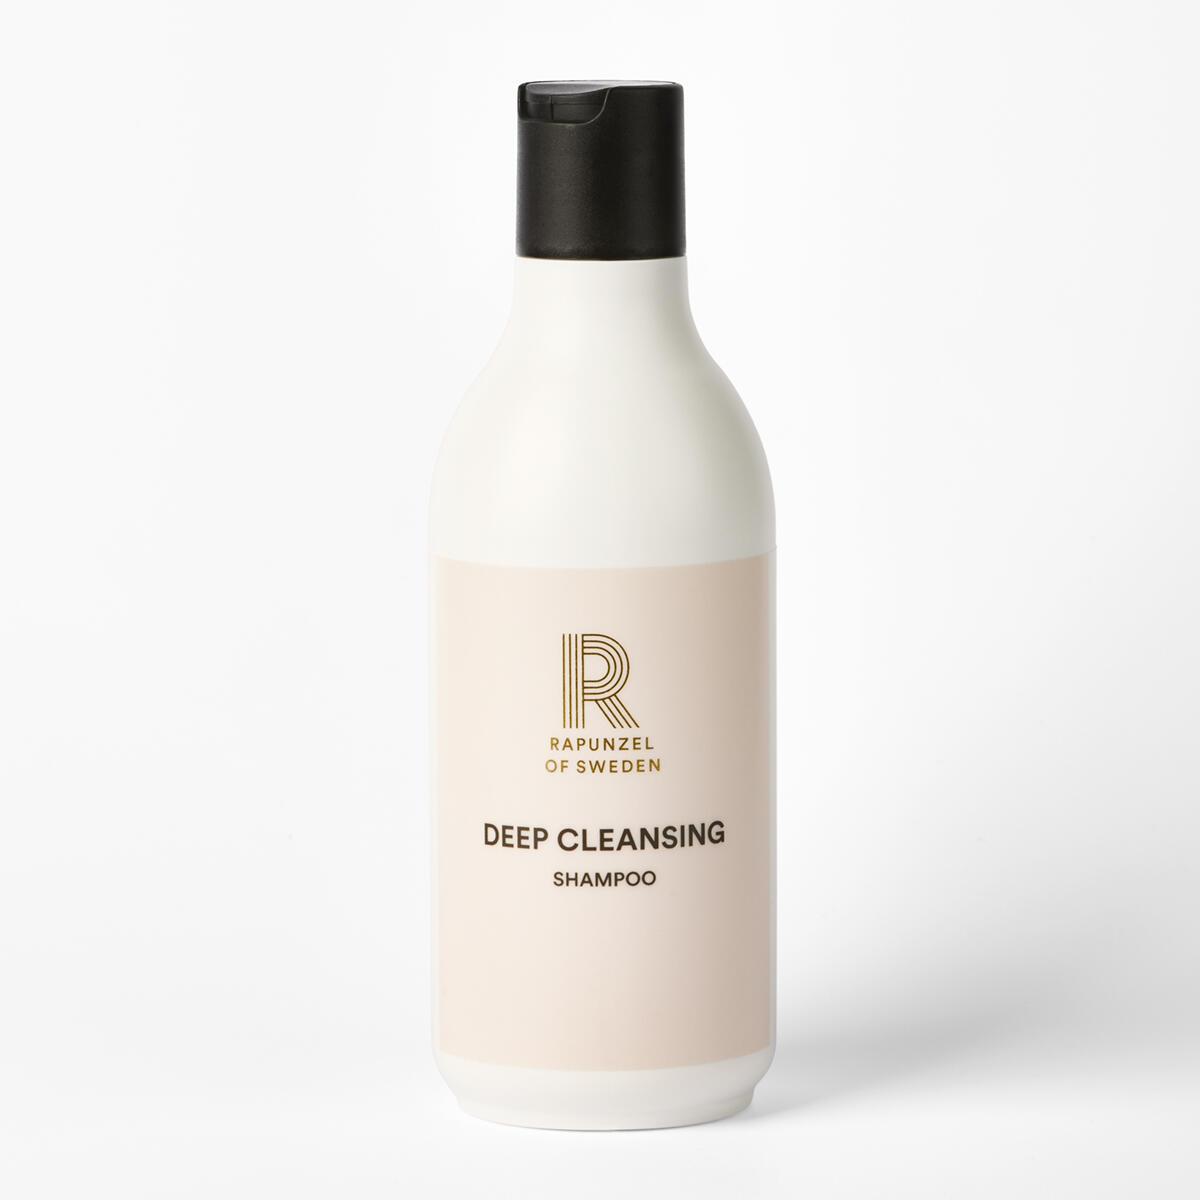 Deep Cleansing Shampoo Tiefreinigendes Shampoo